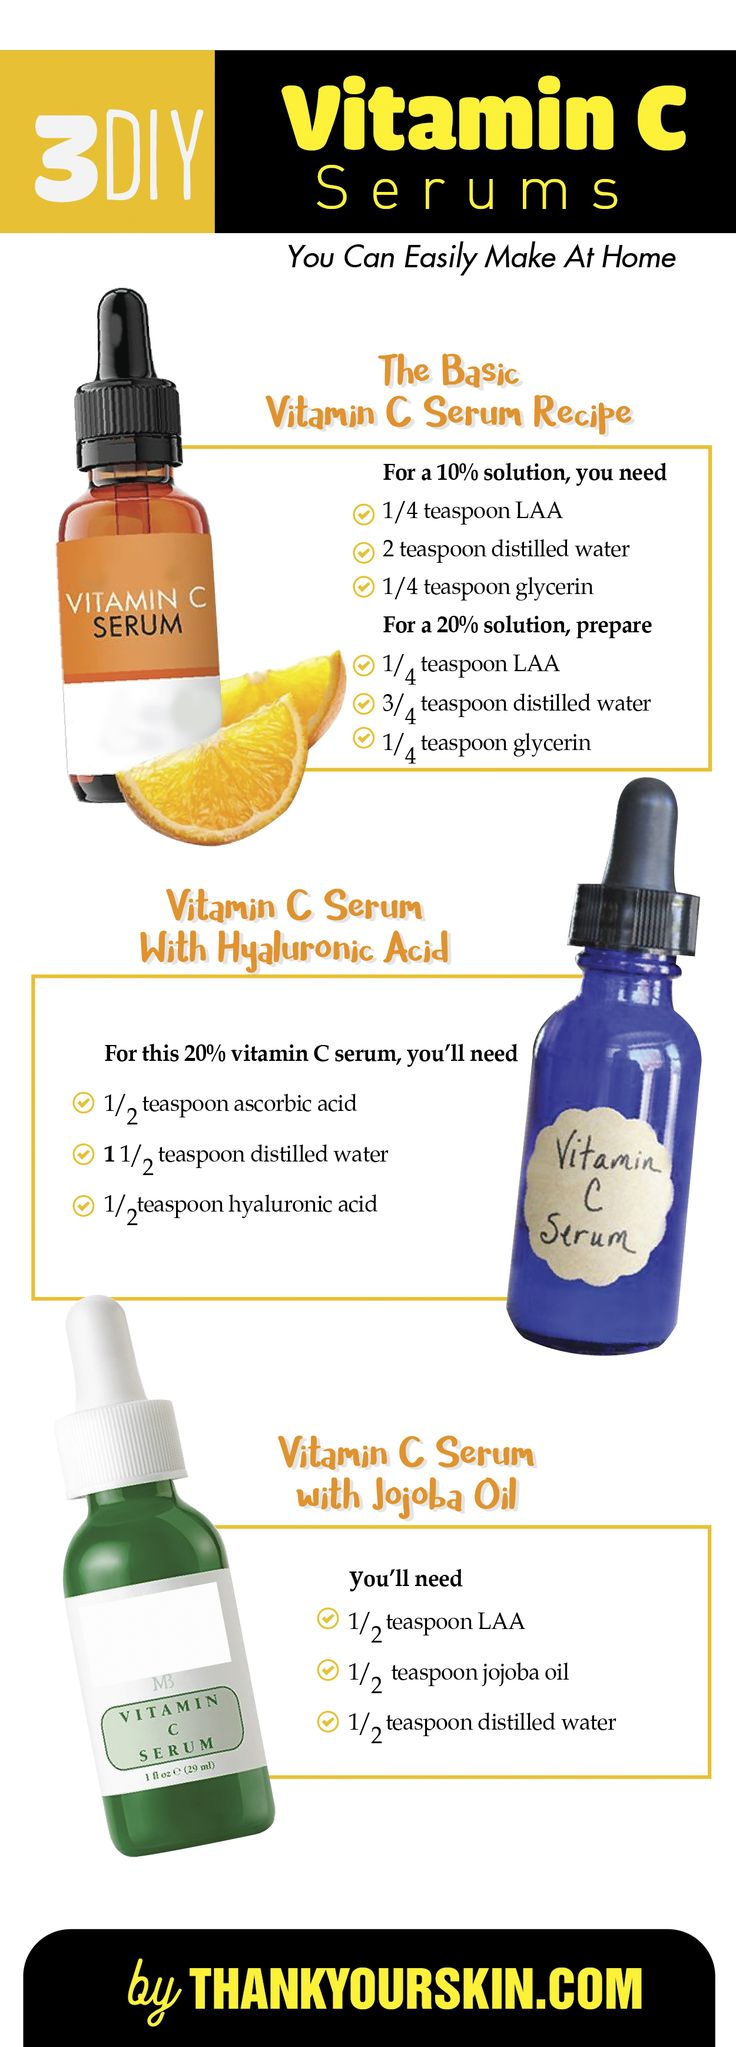 Vitamin C Benefits For Athletes